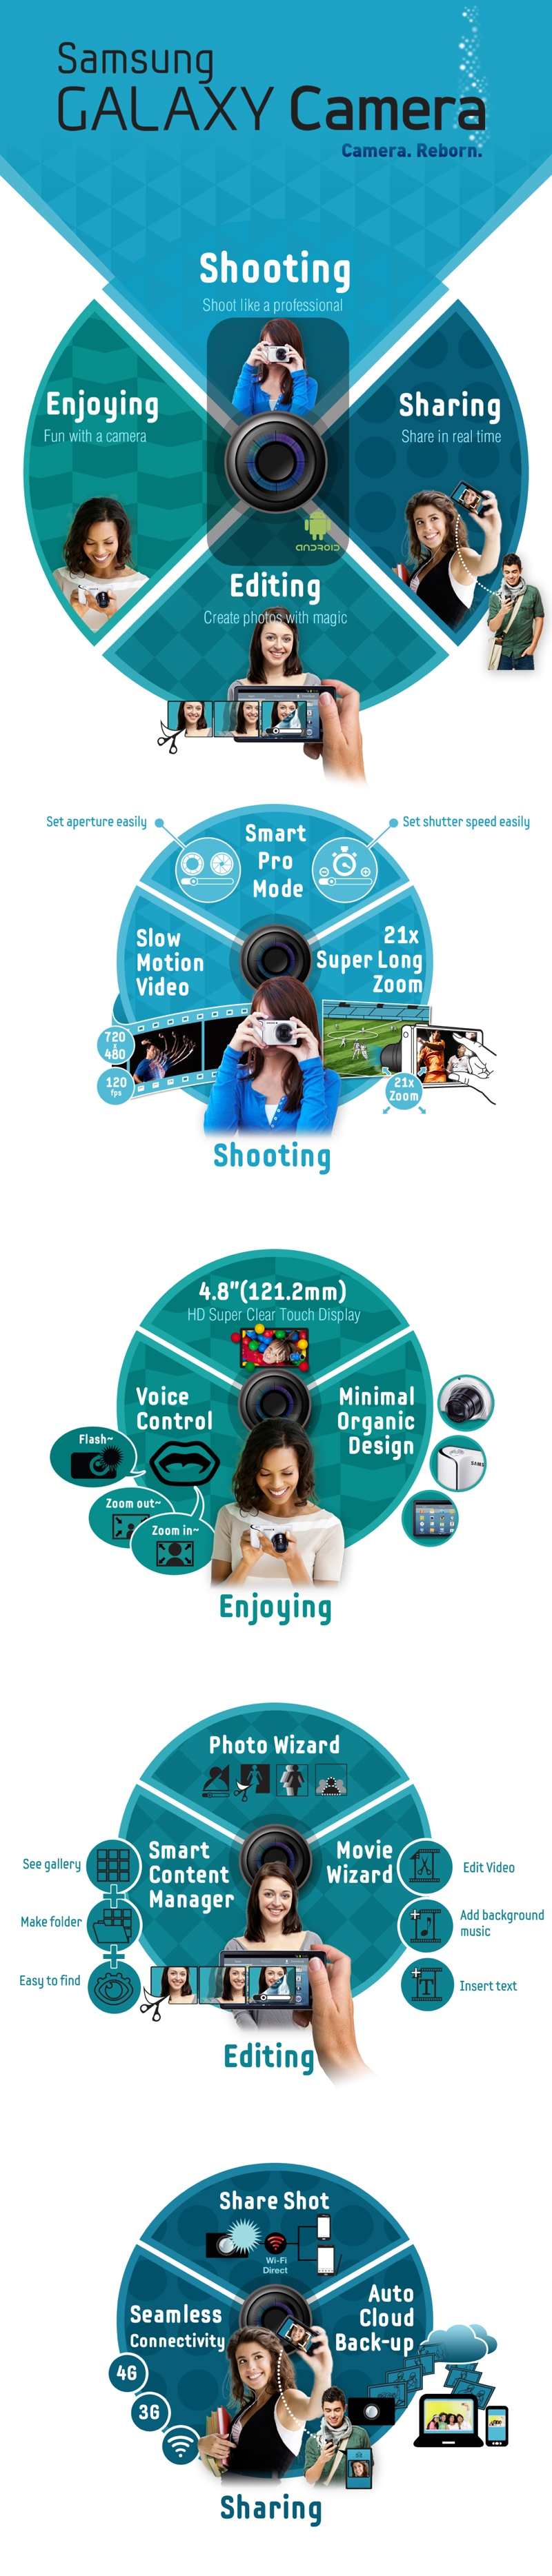 GALAXY_Camera_Infographic.jpg